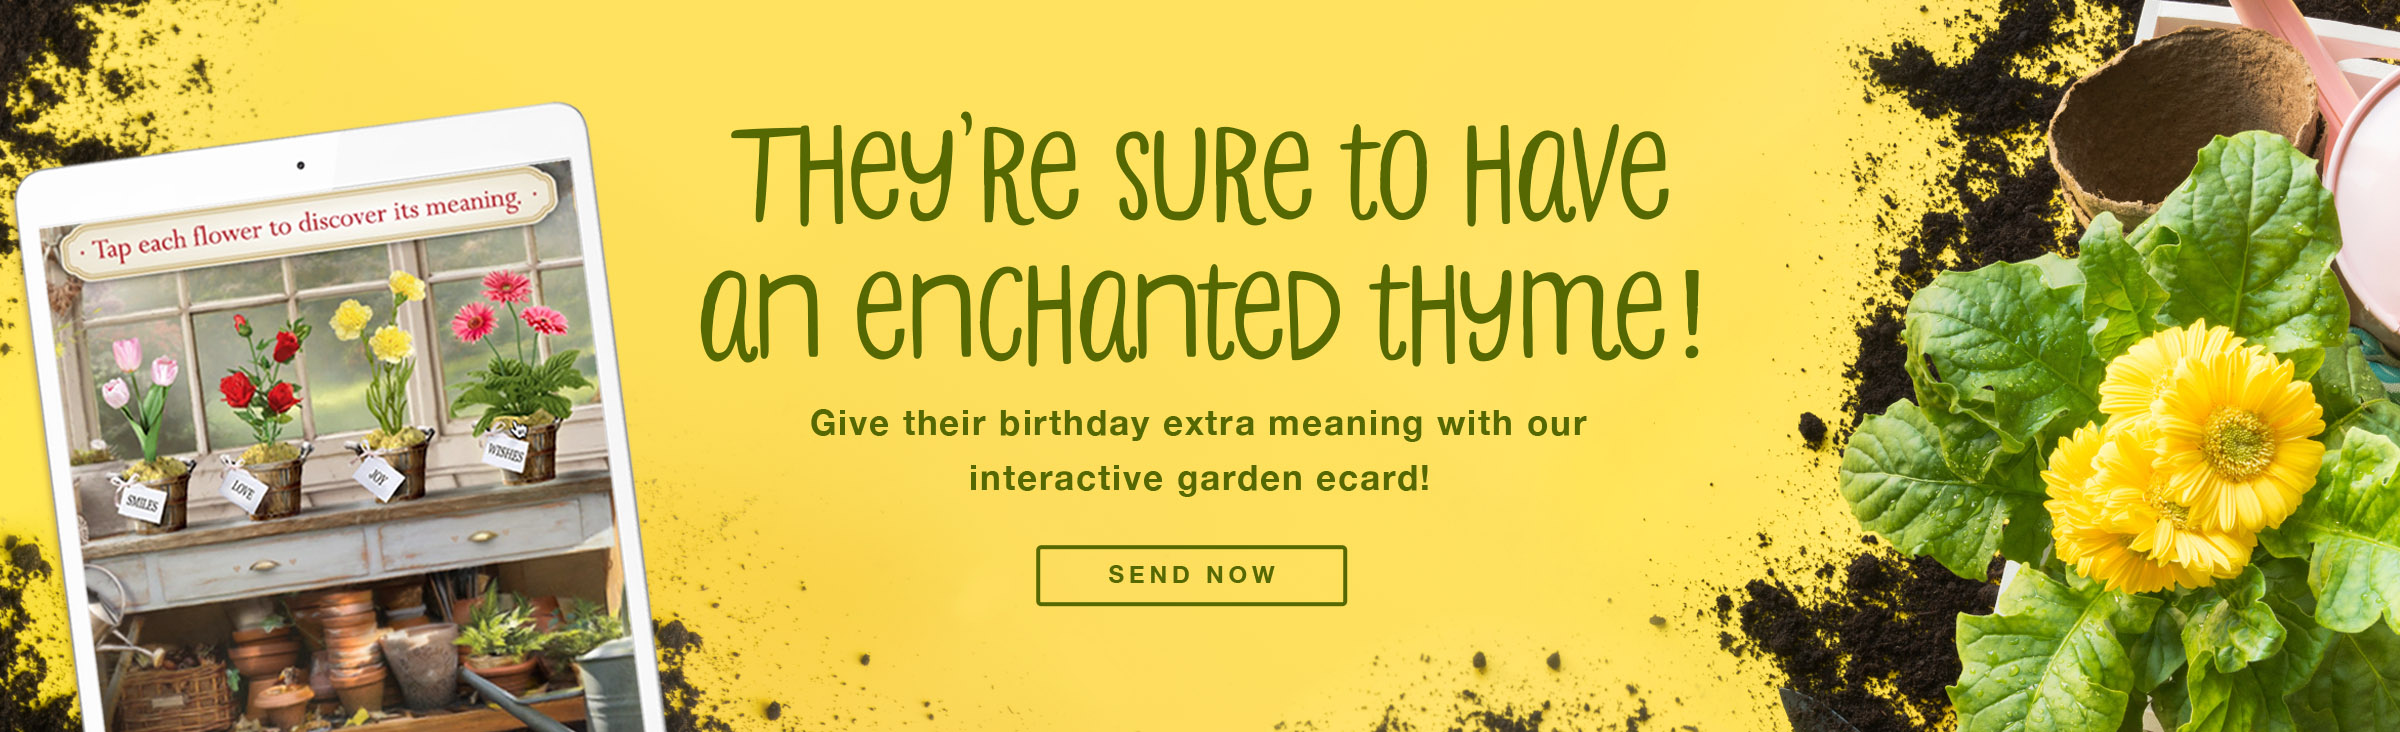 Birthday Garden Ecard - Send Now